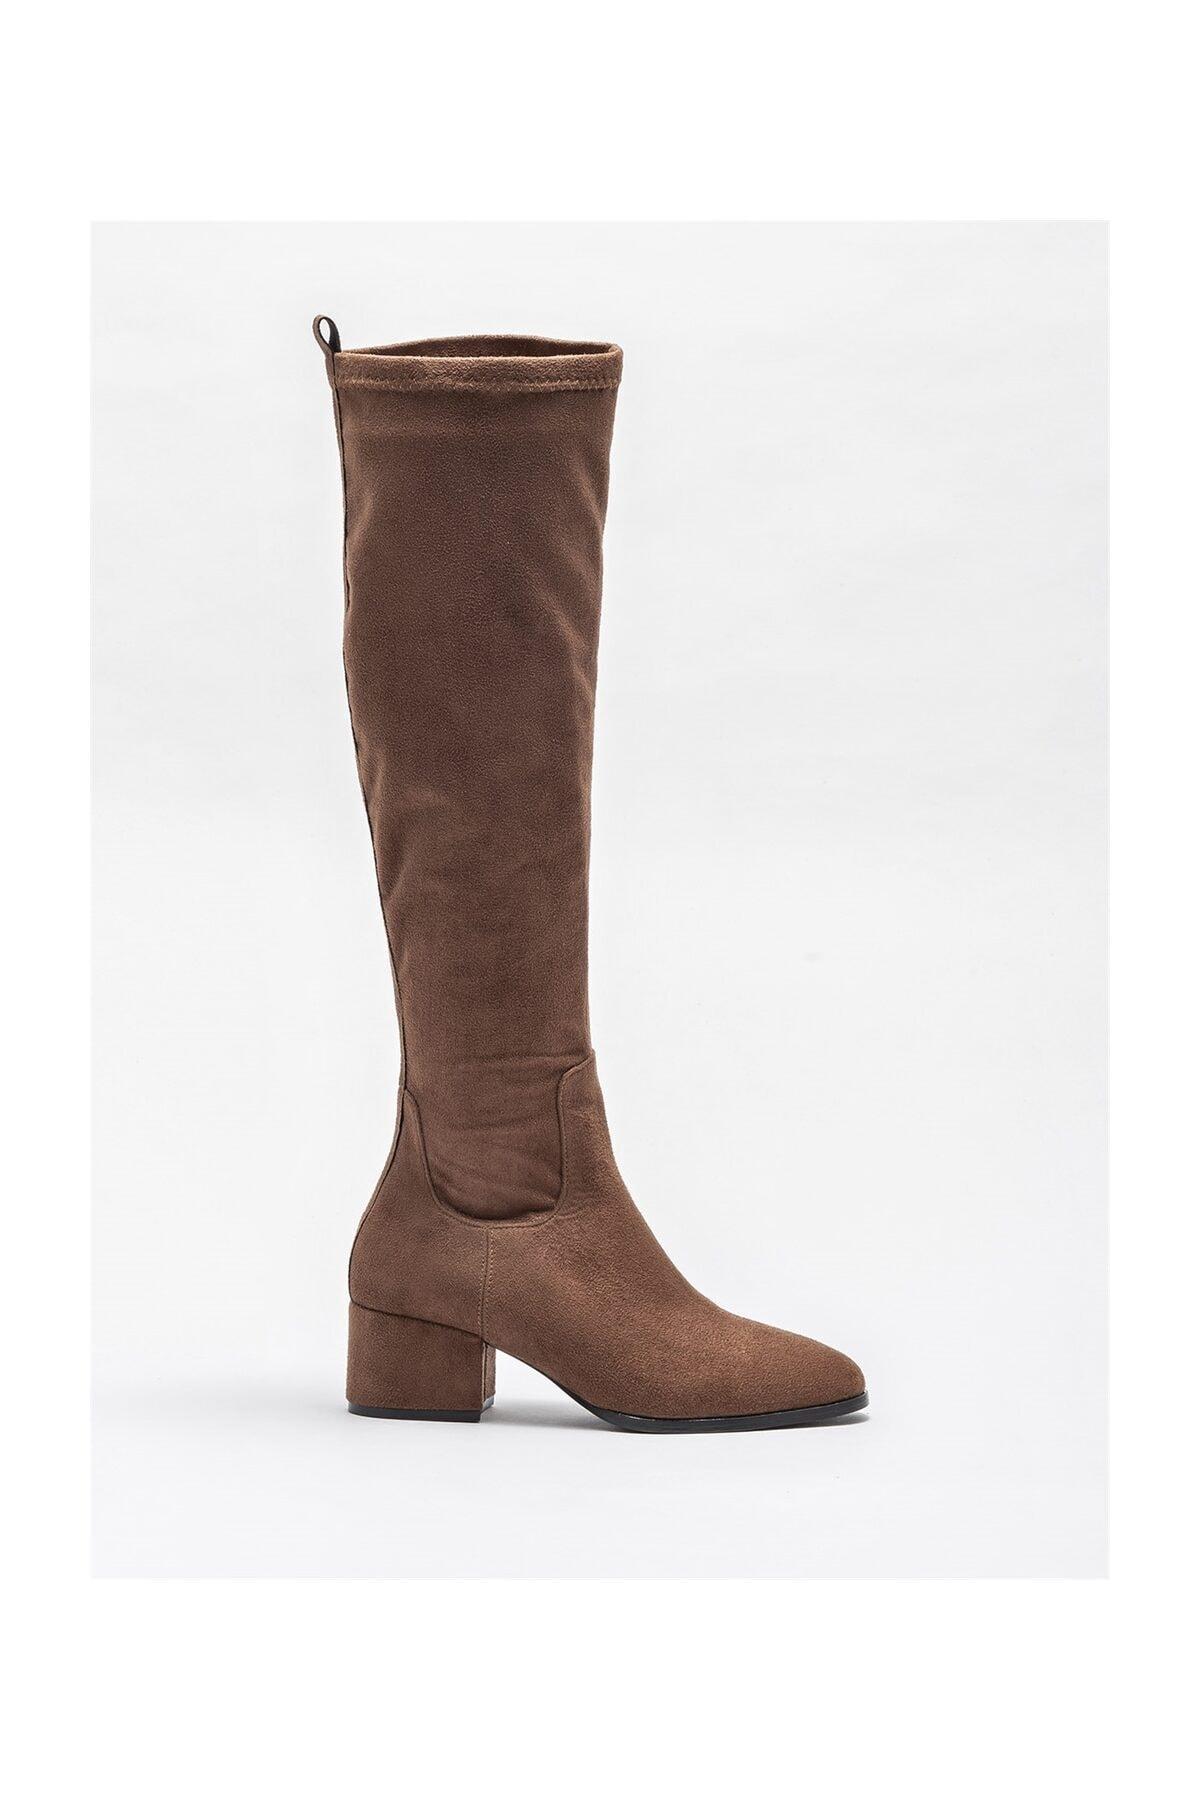 Elle Shoes Kadın Çizme 20KTO34102 1